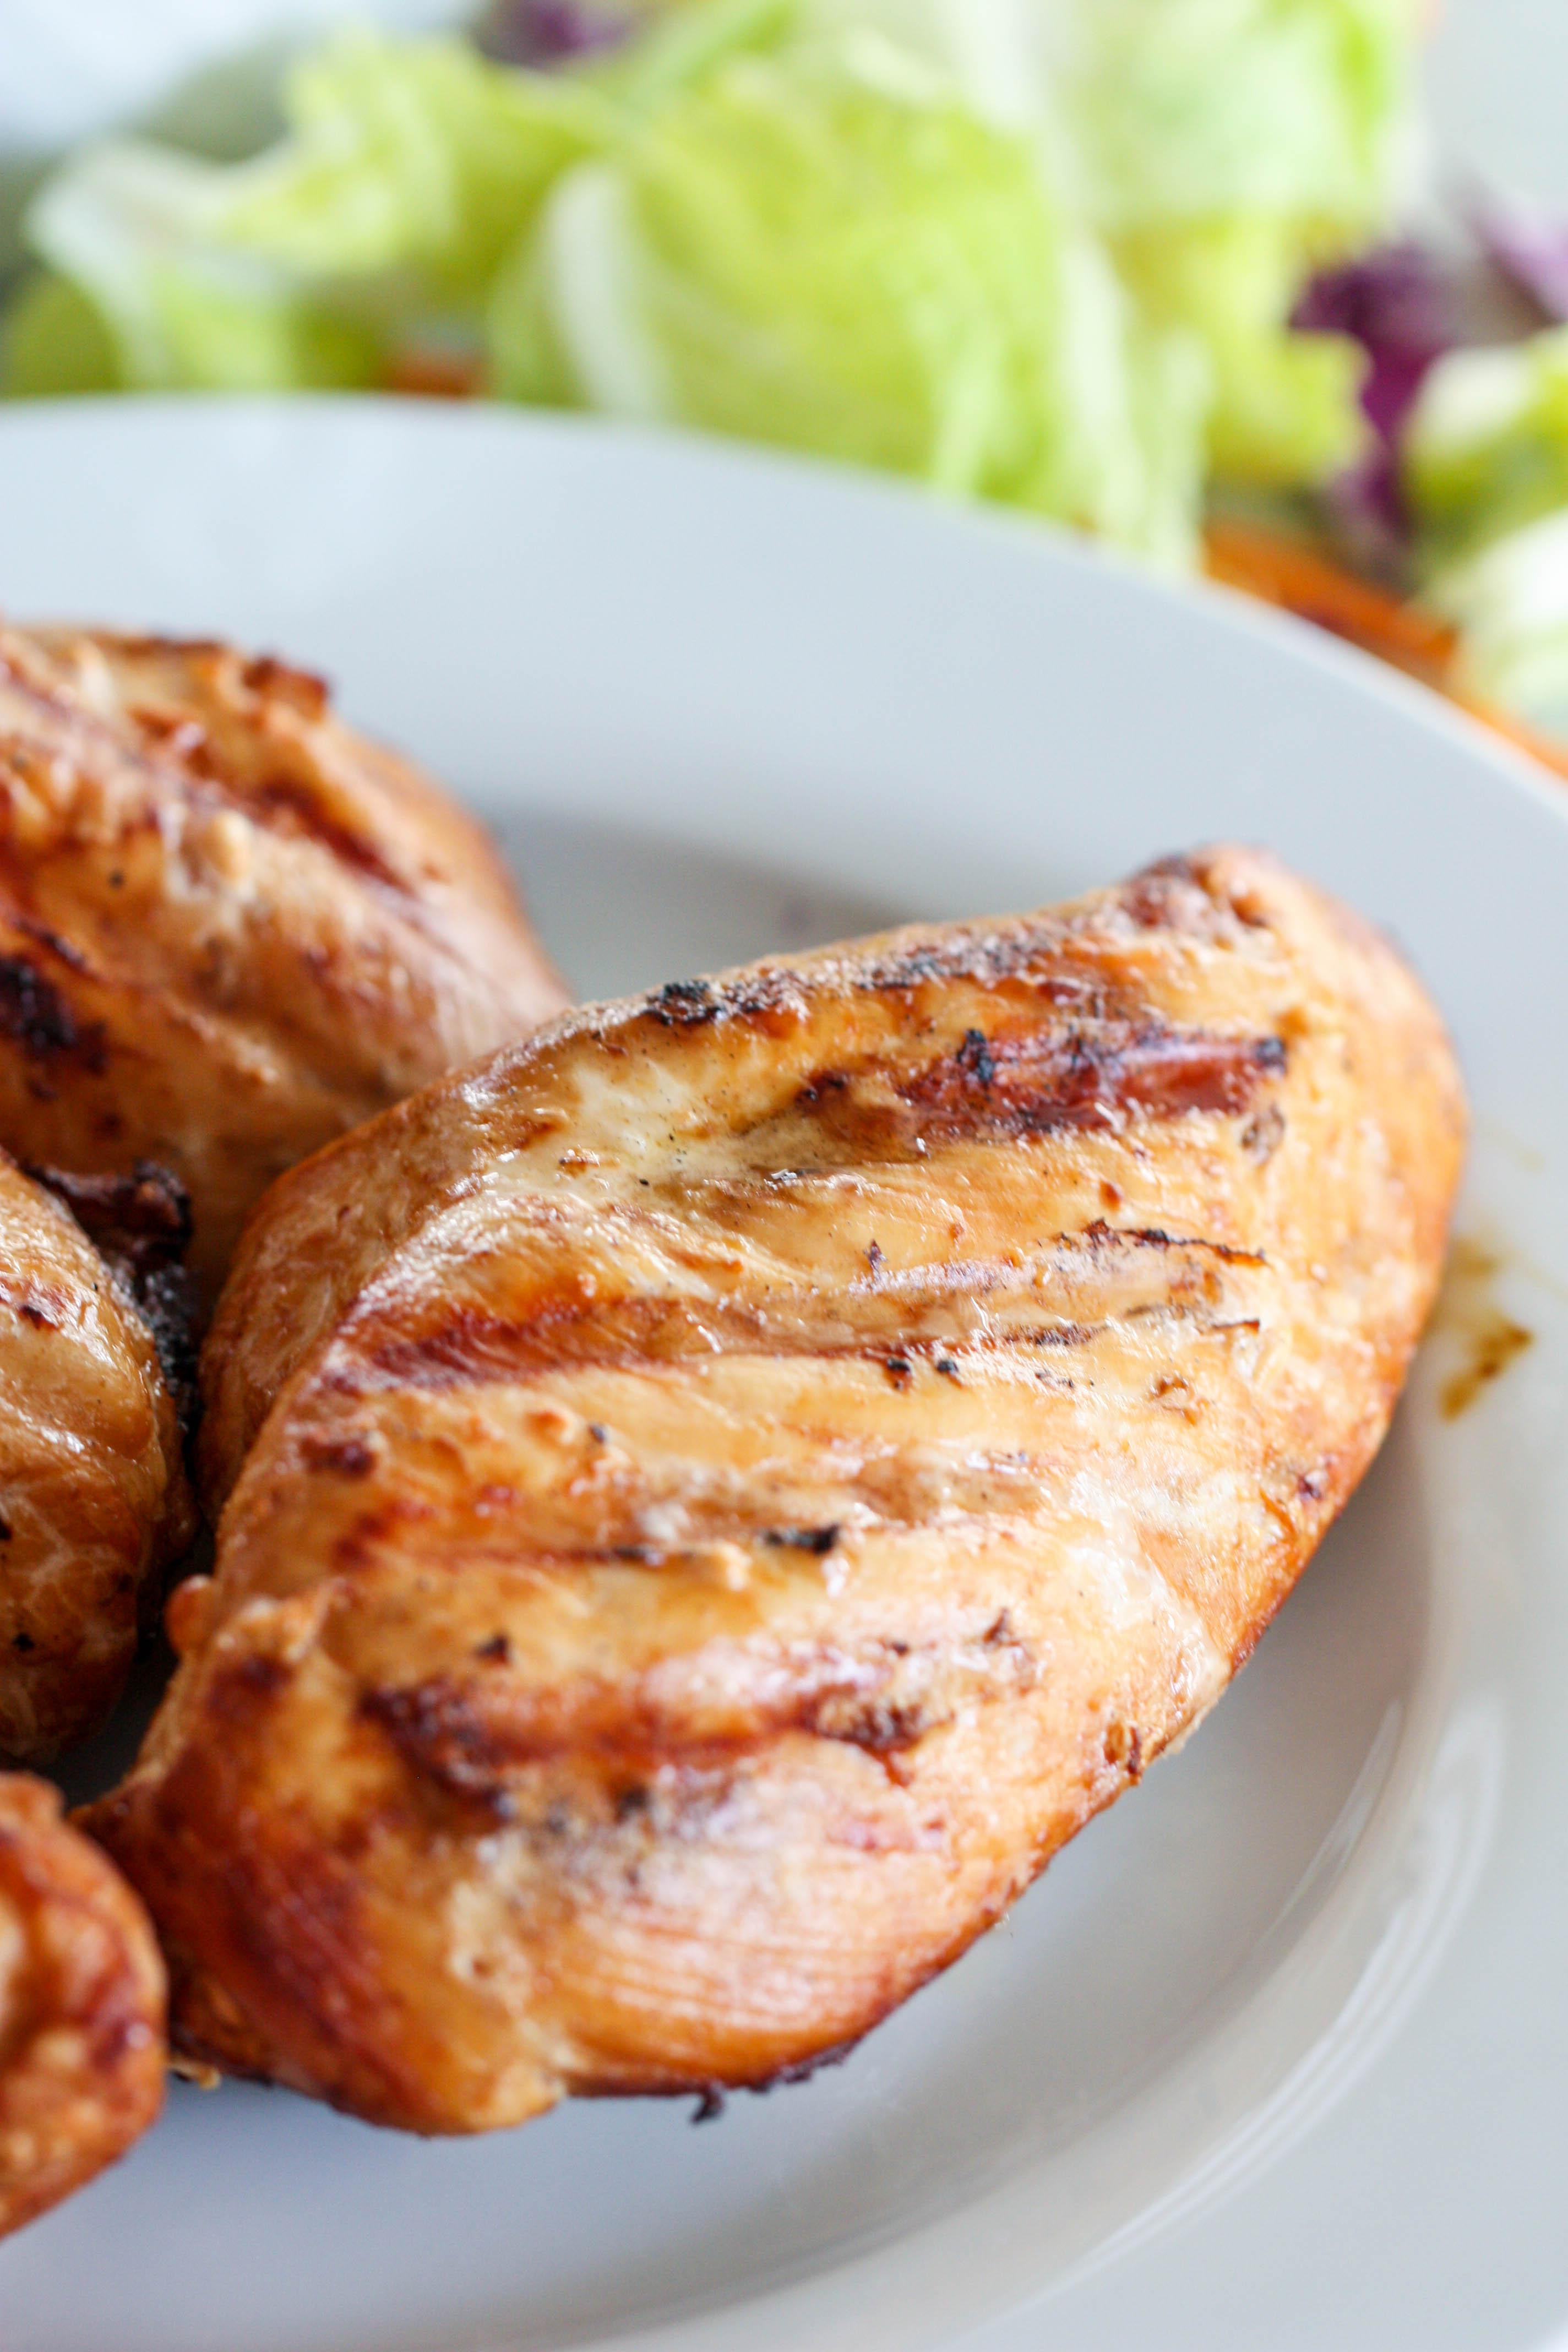 Mom's SECRET Recipe: Grilled 7-UP Chicken Recipe